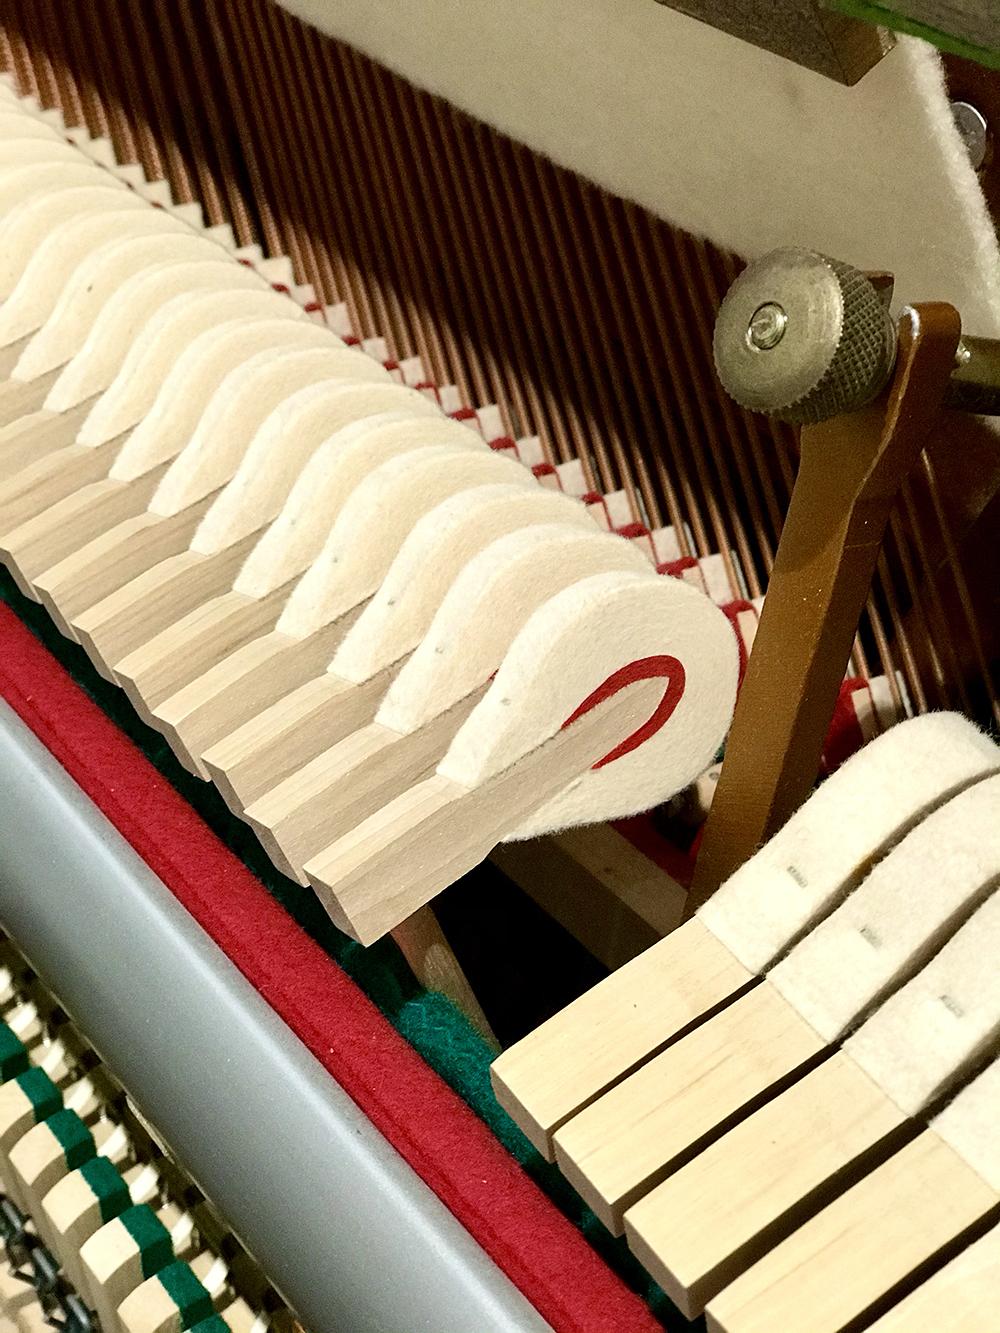 John-Broadwood-Upright-Quality-Piano-Dorset-9.jpg